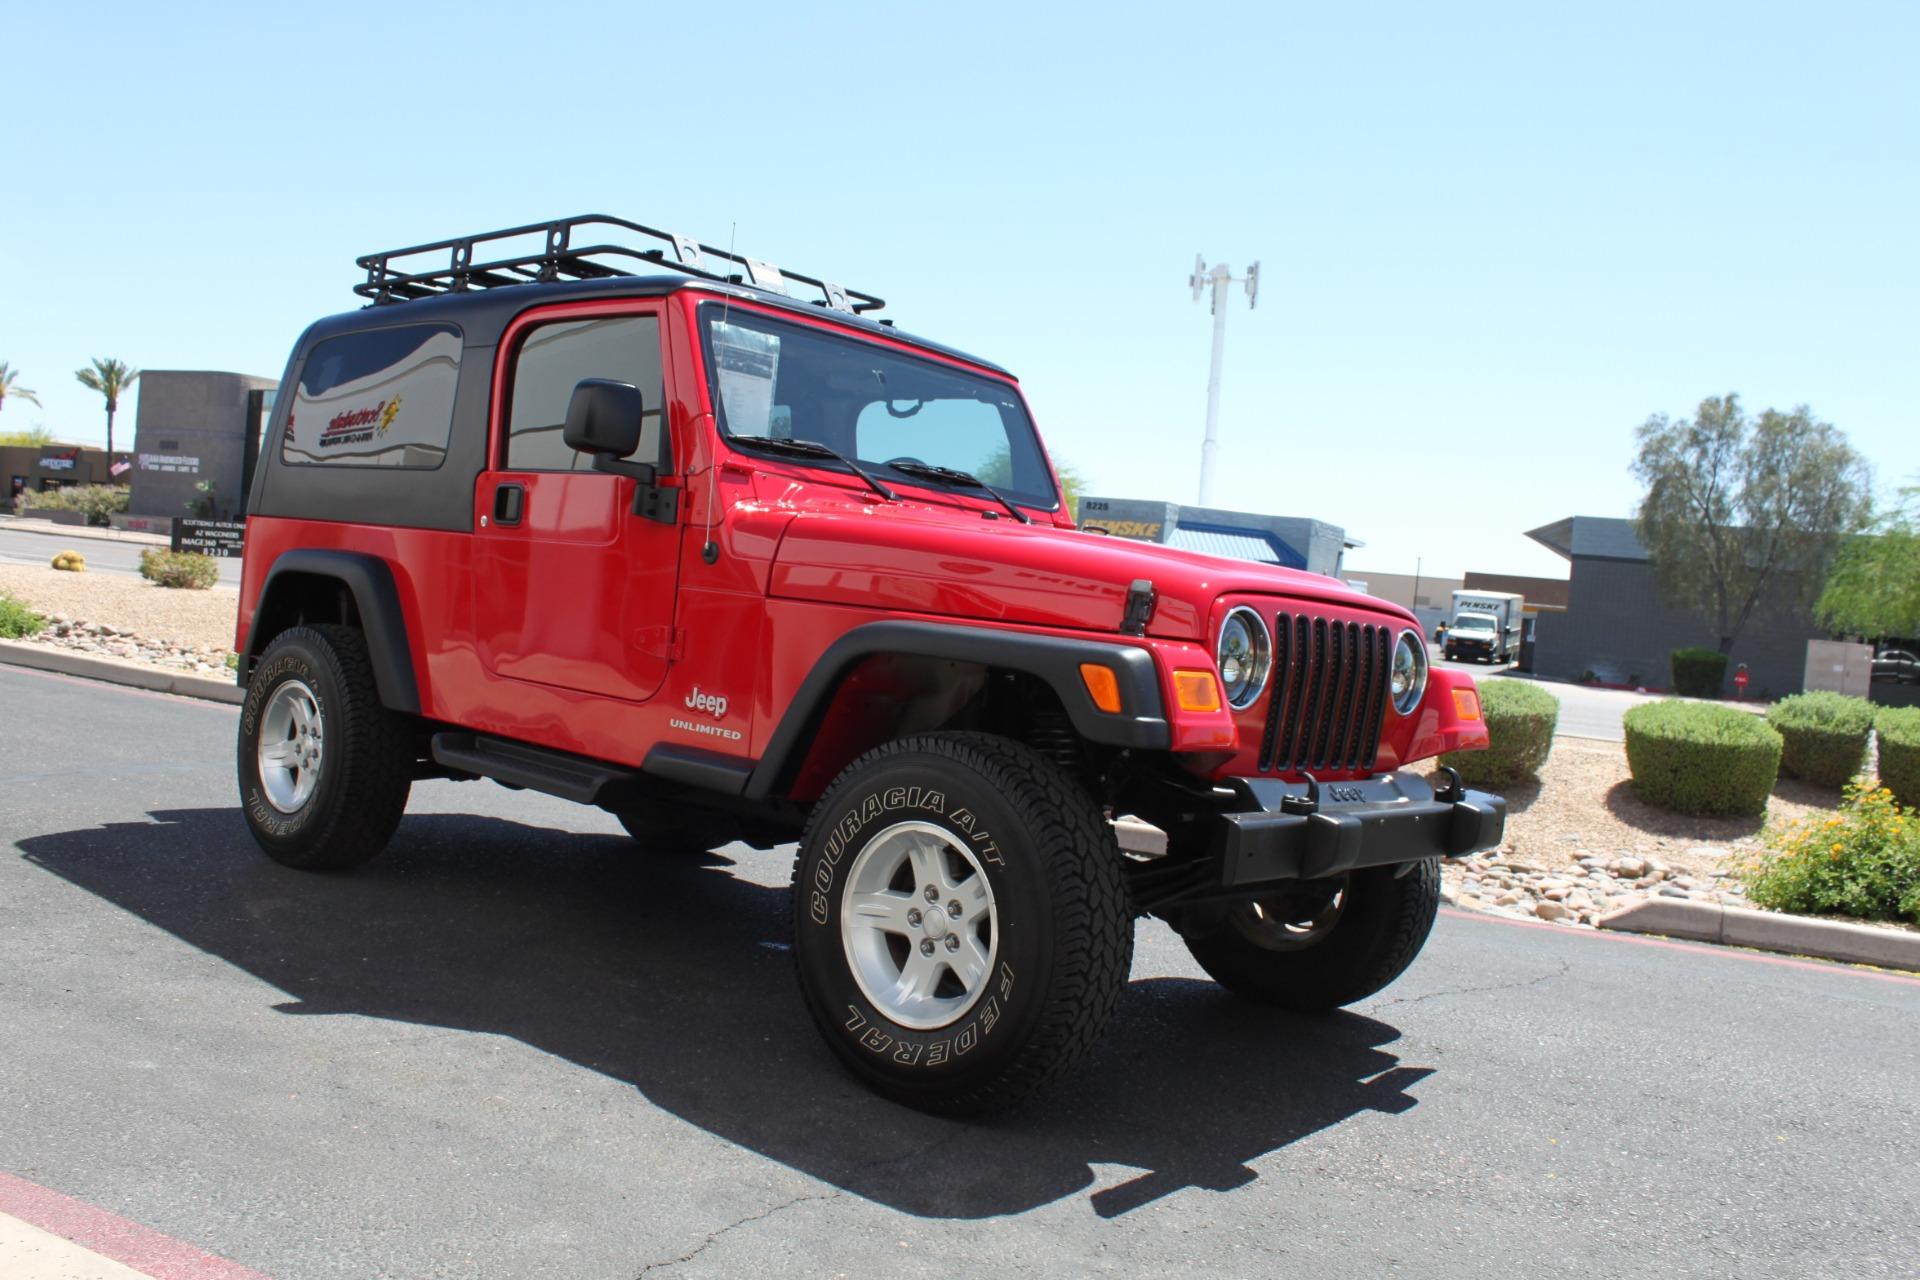 Used-2006-Jeep-Wrangler-4X4-LJ-Unlimited-LWB-Chevrolet